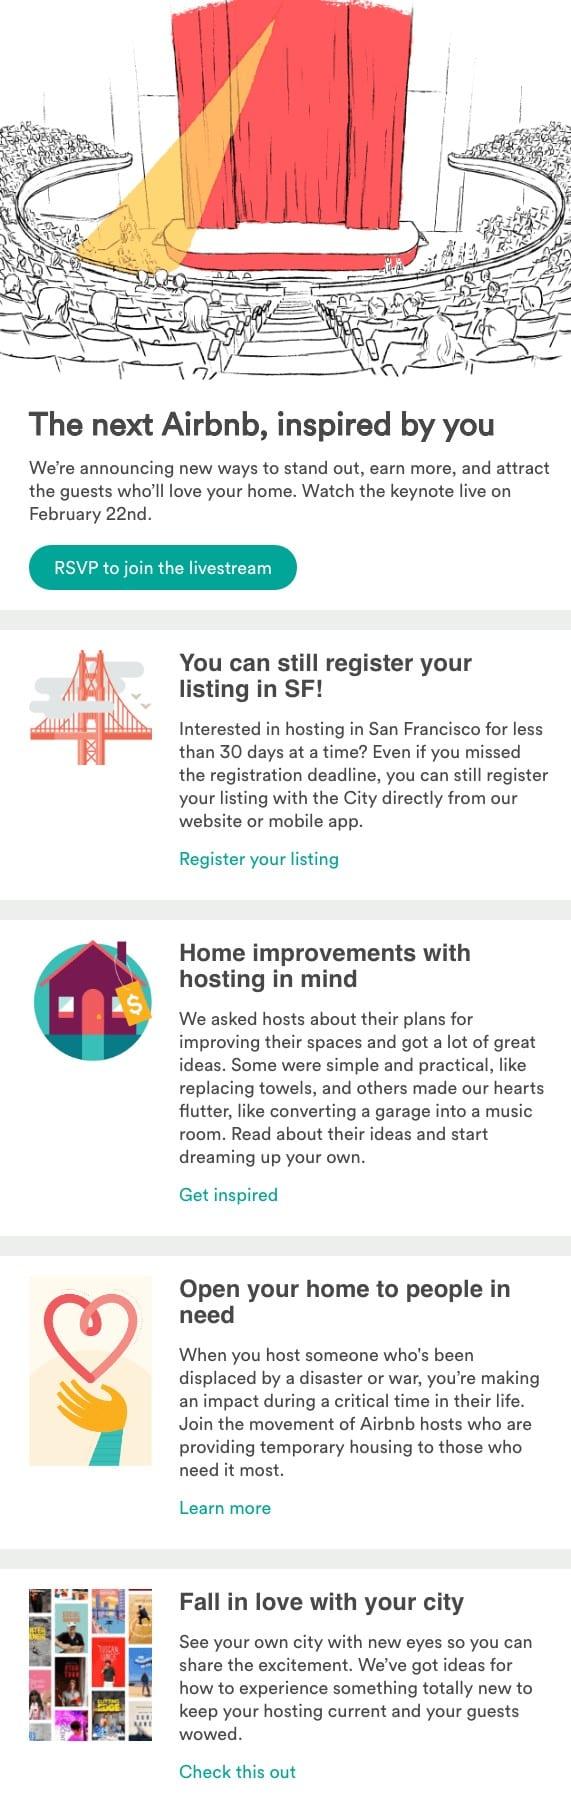 airbnb-employee-newsletters-visual-storytelling